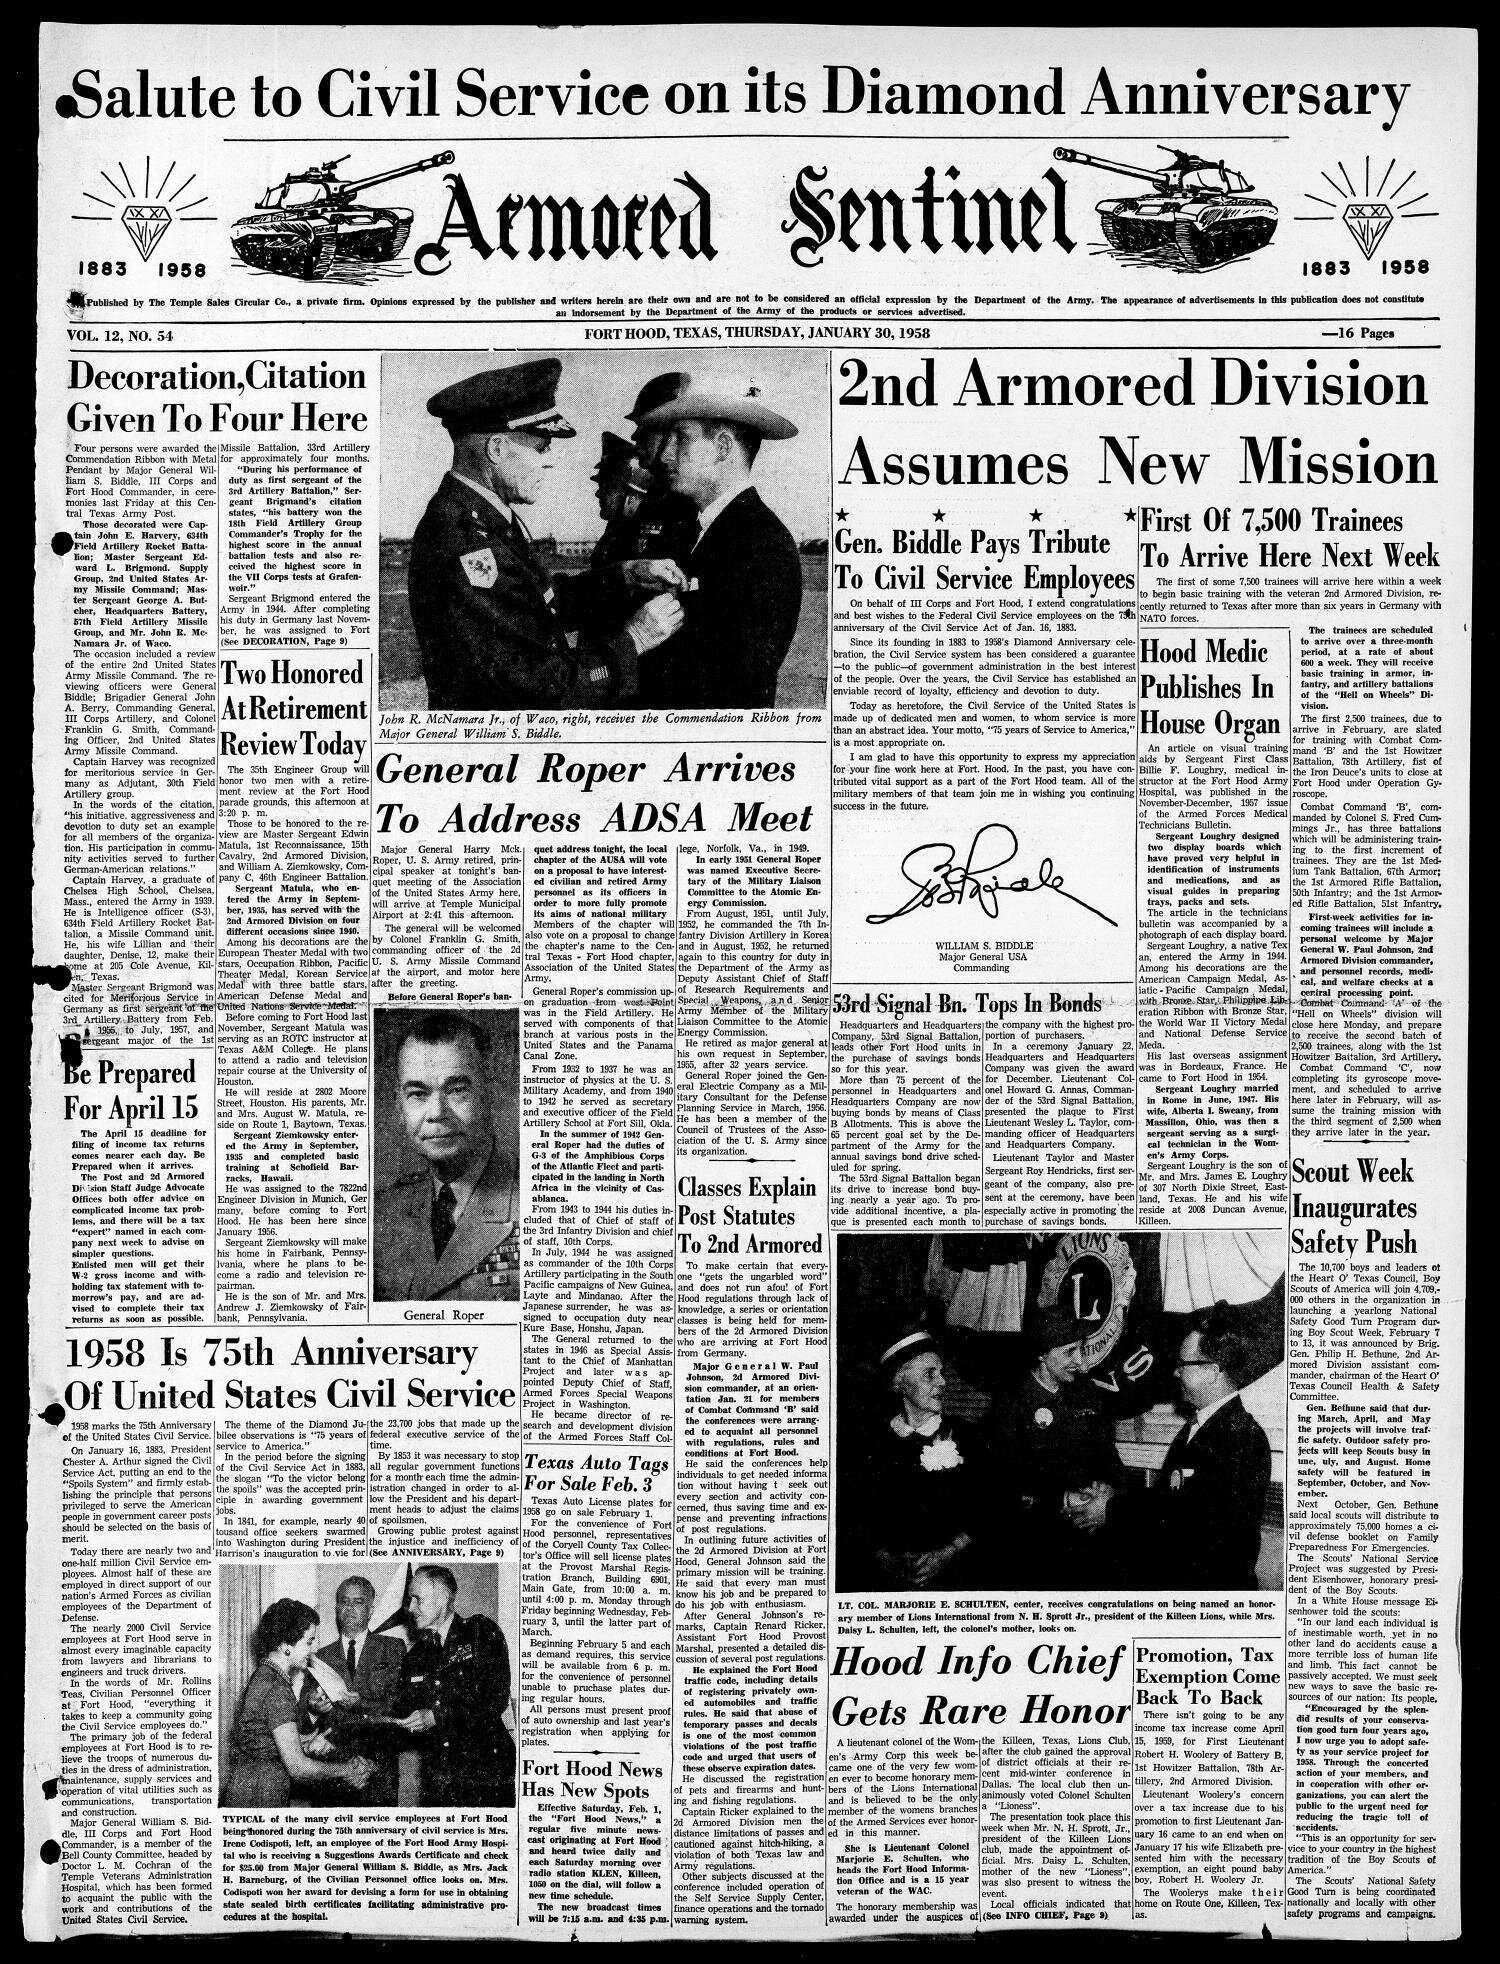 ARMORED SENTINEL_30 JAN 1958.jpg